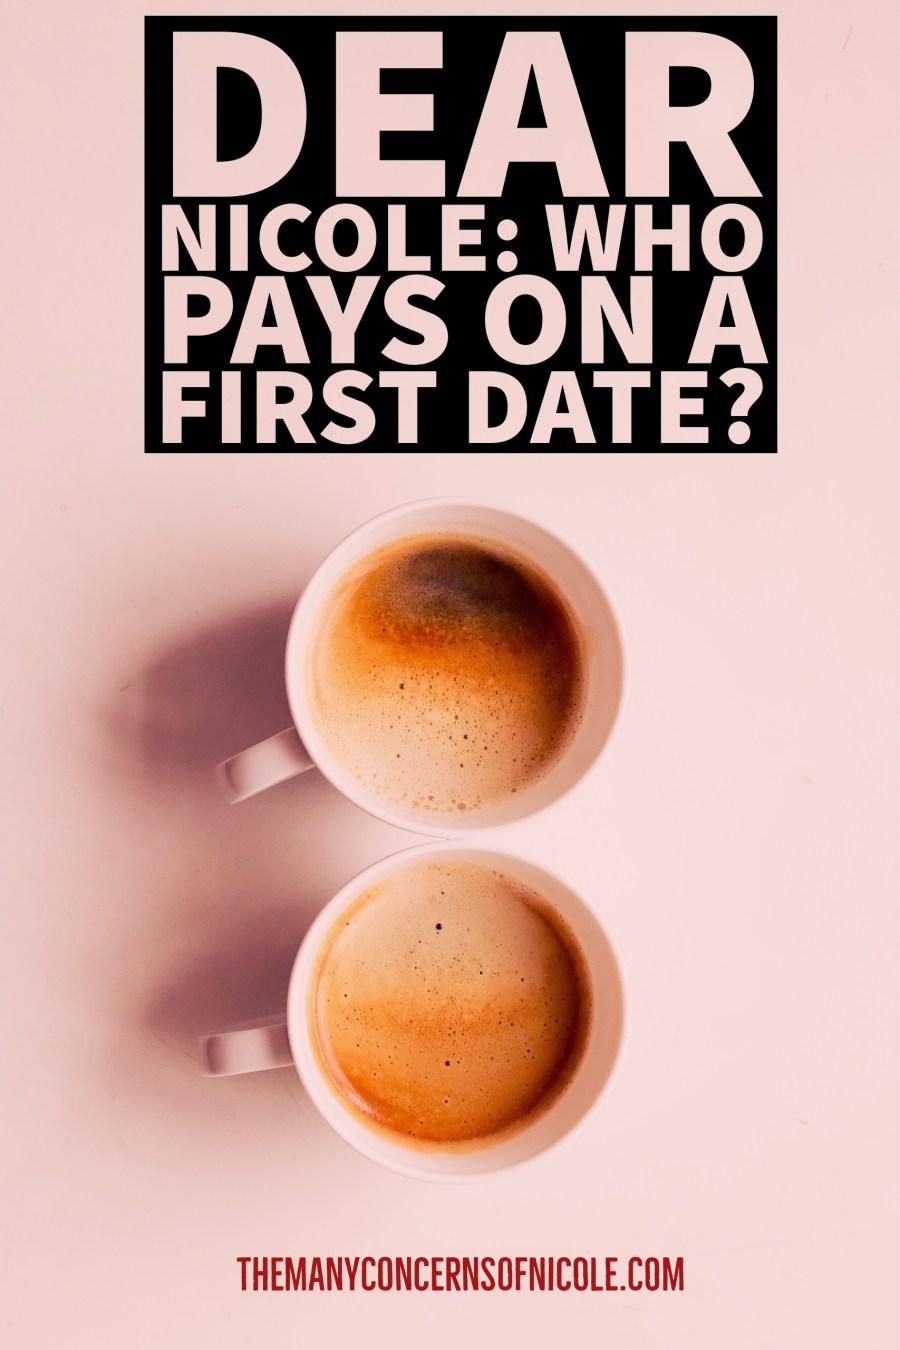 First Date?